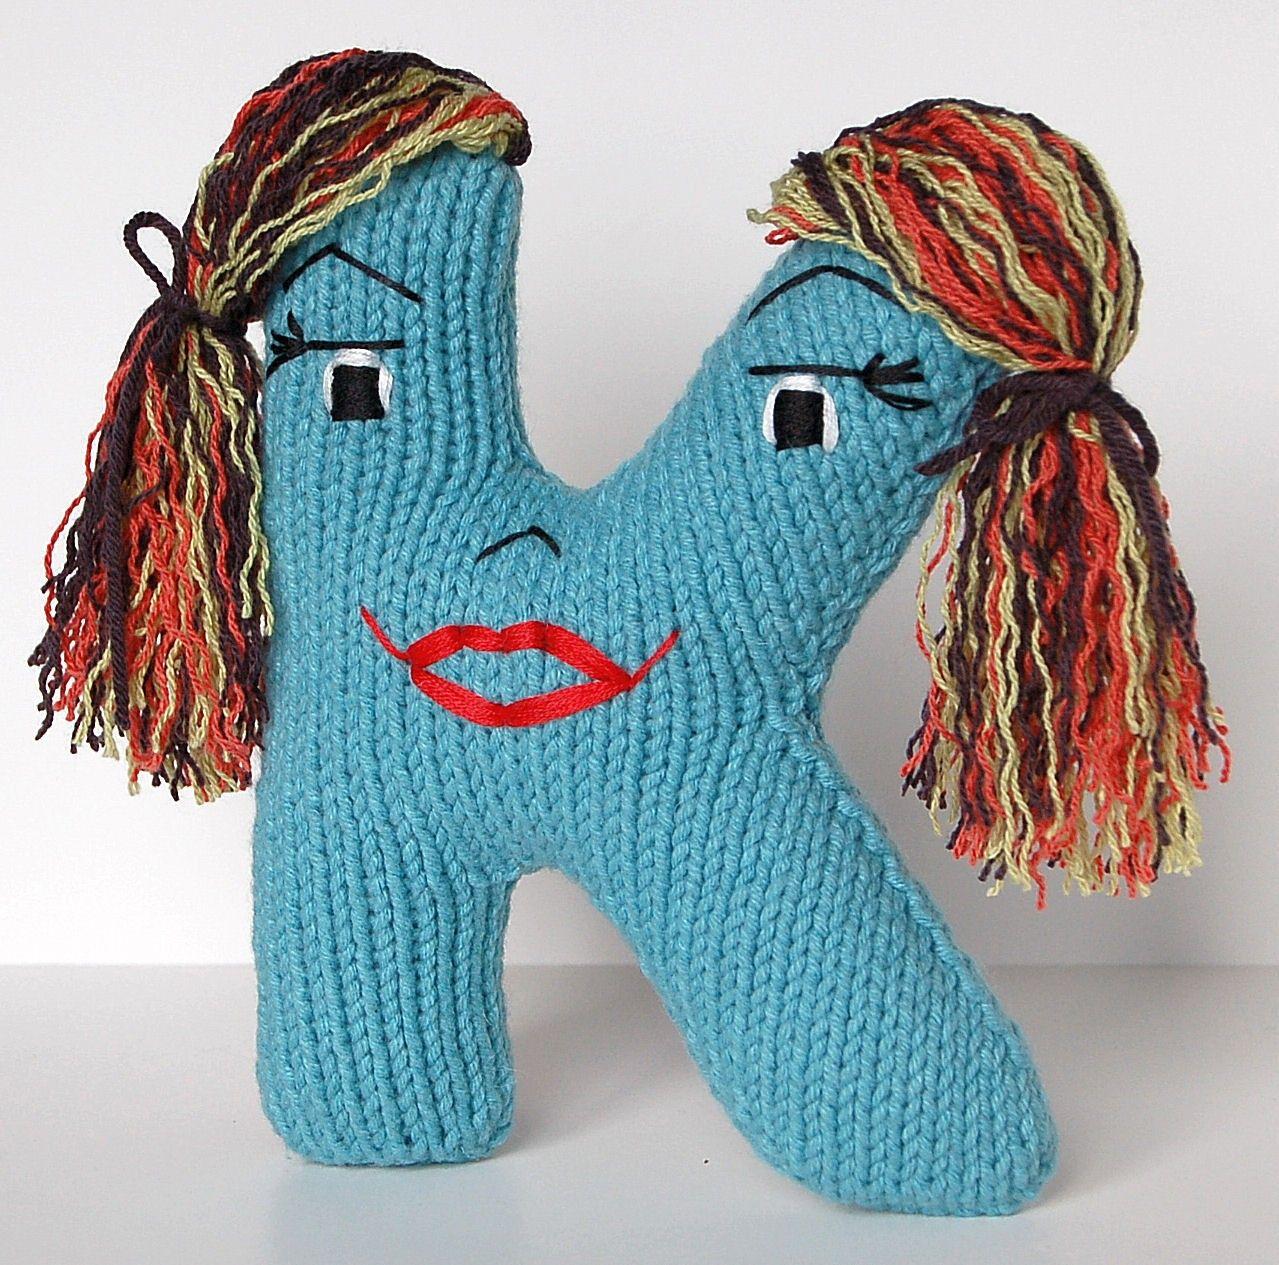 Letter K - Alphabet Plush Toy Knitting PATTERN - Karianne | Plush ...